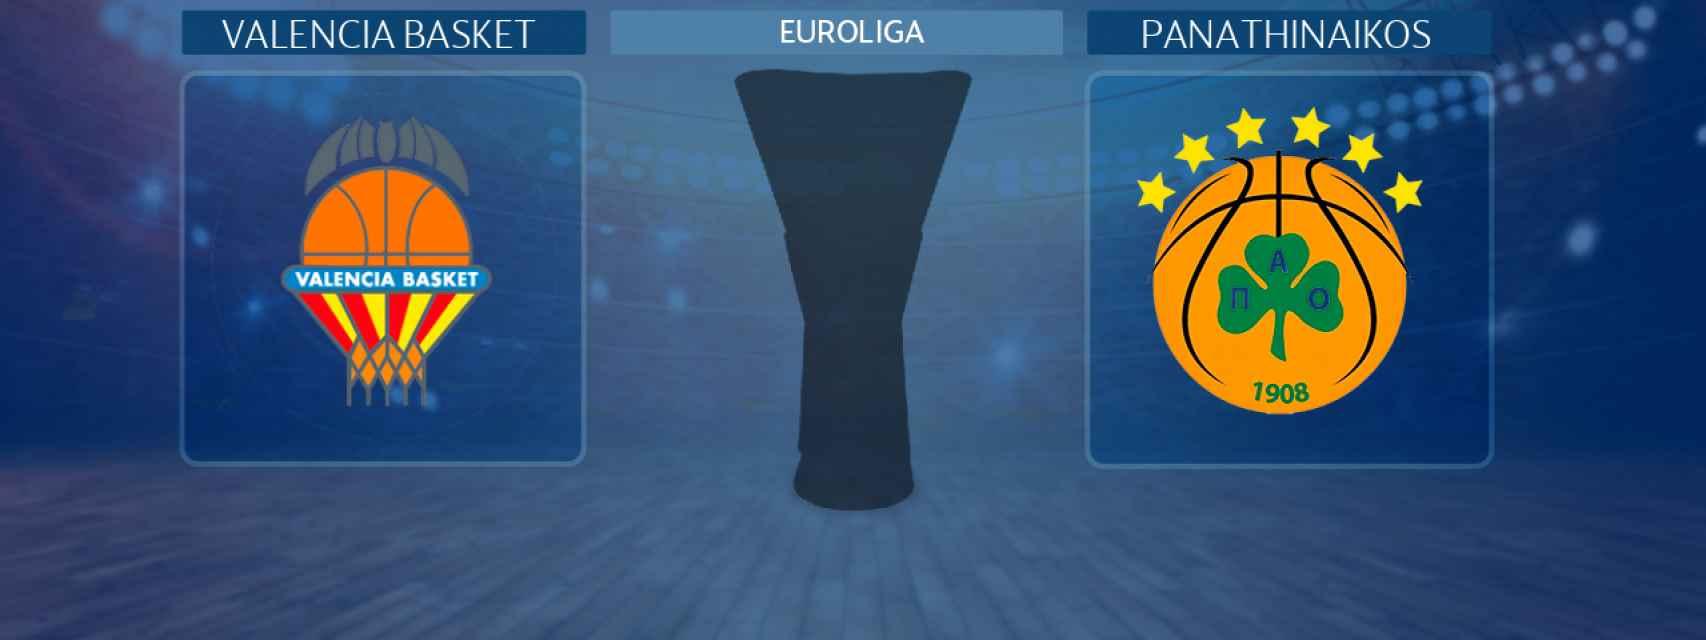 Valencia Basket - Panathinaikos, partido de la Euroliga